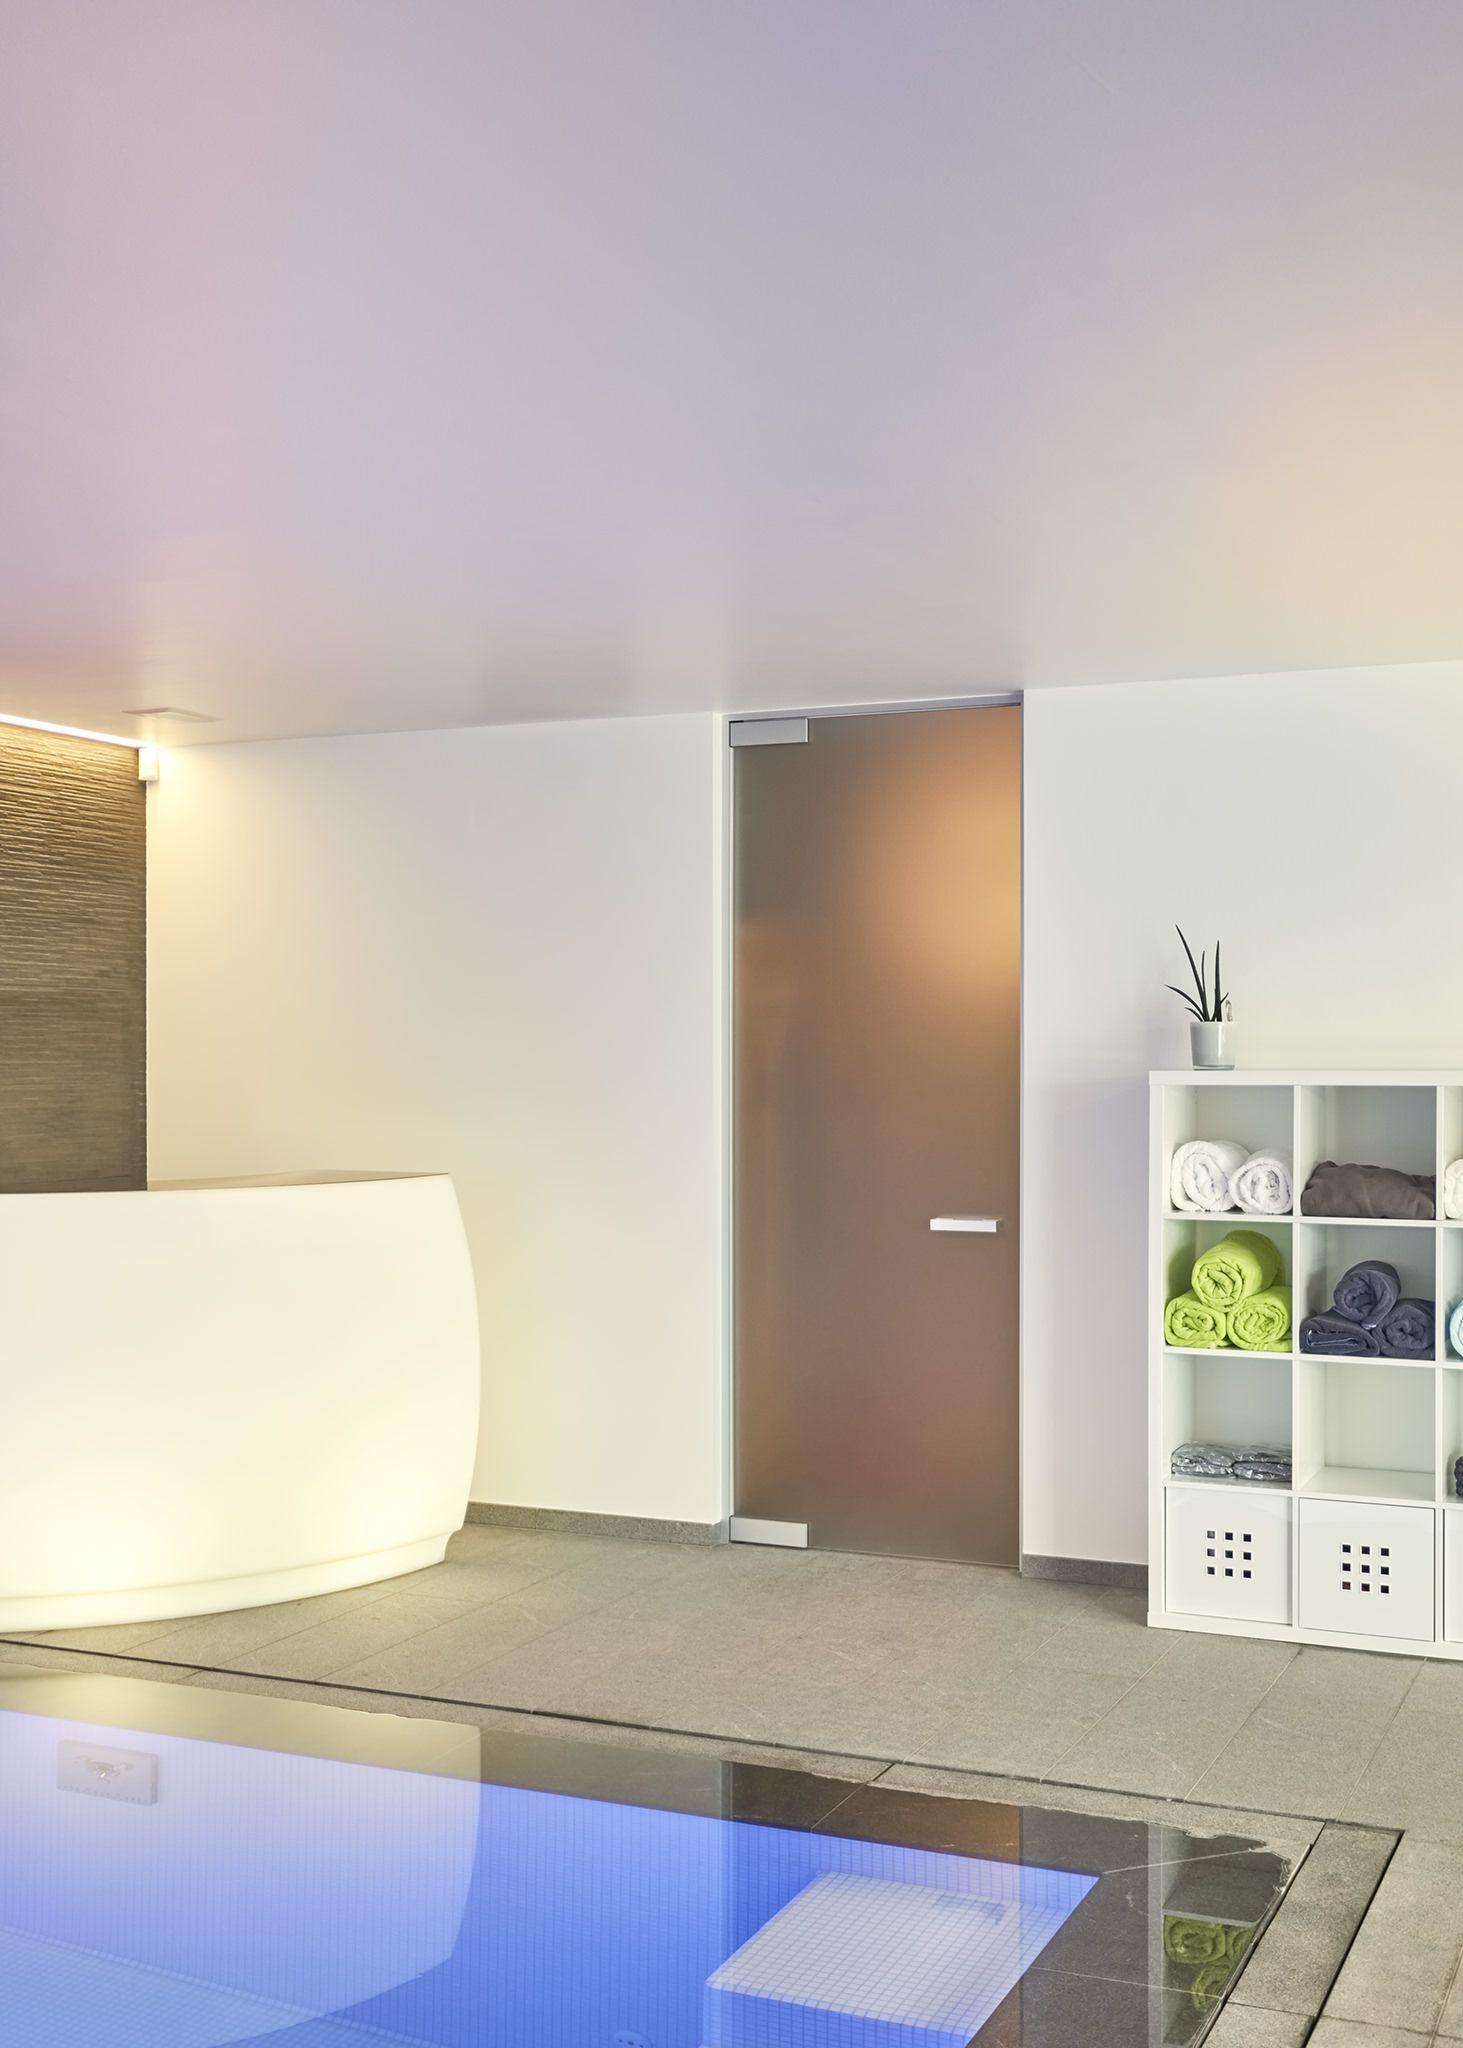 porte vitr e opaque sur mesure avec verre d poli l 39 acide anywaydoors portes vitr es. Black Bedroom Furniture Sets. Home Design Ideas